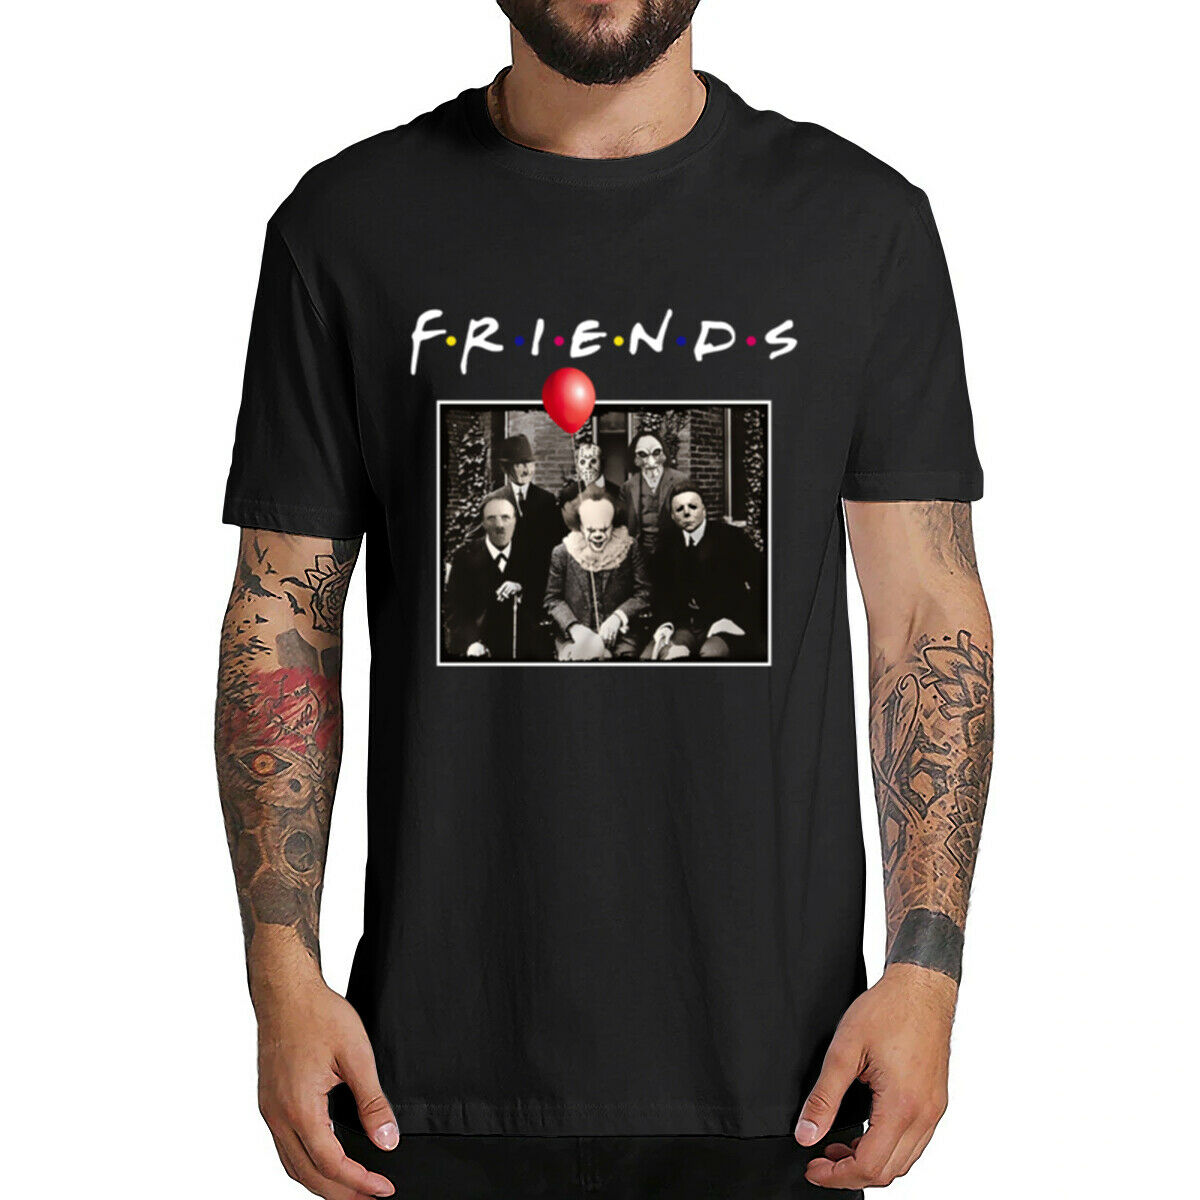 Horror Freunde Pennywise Michael Myers Jason Voorhees Halloween Männer T-Shirt Top baumwolle kurzarm T Hemd Camiseta masculina